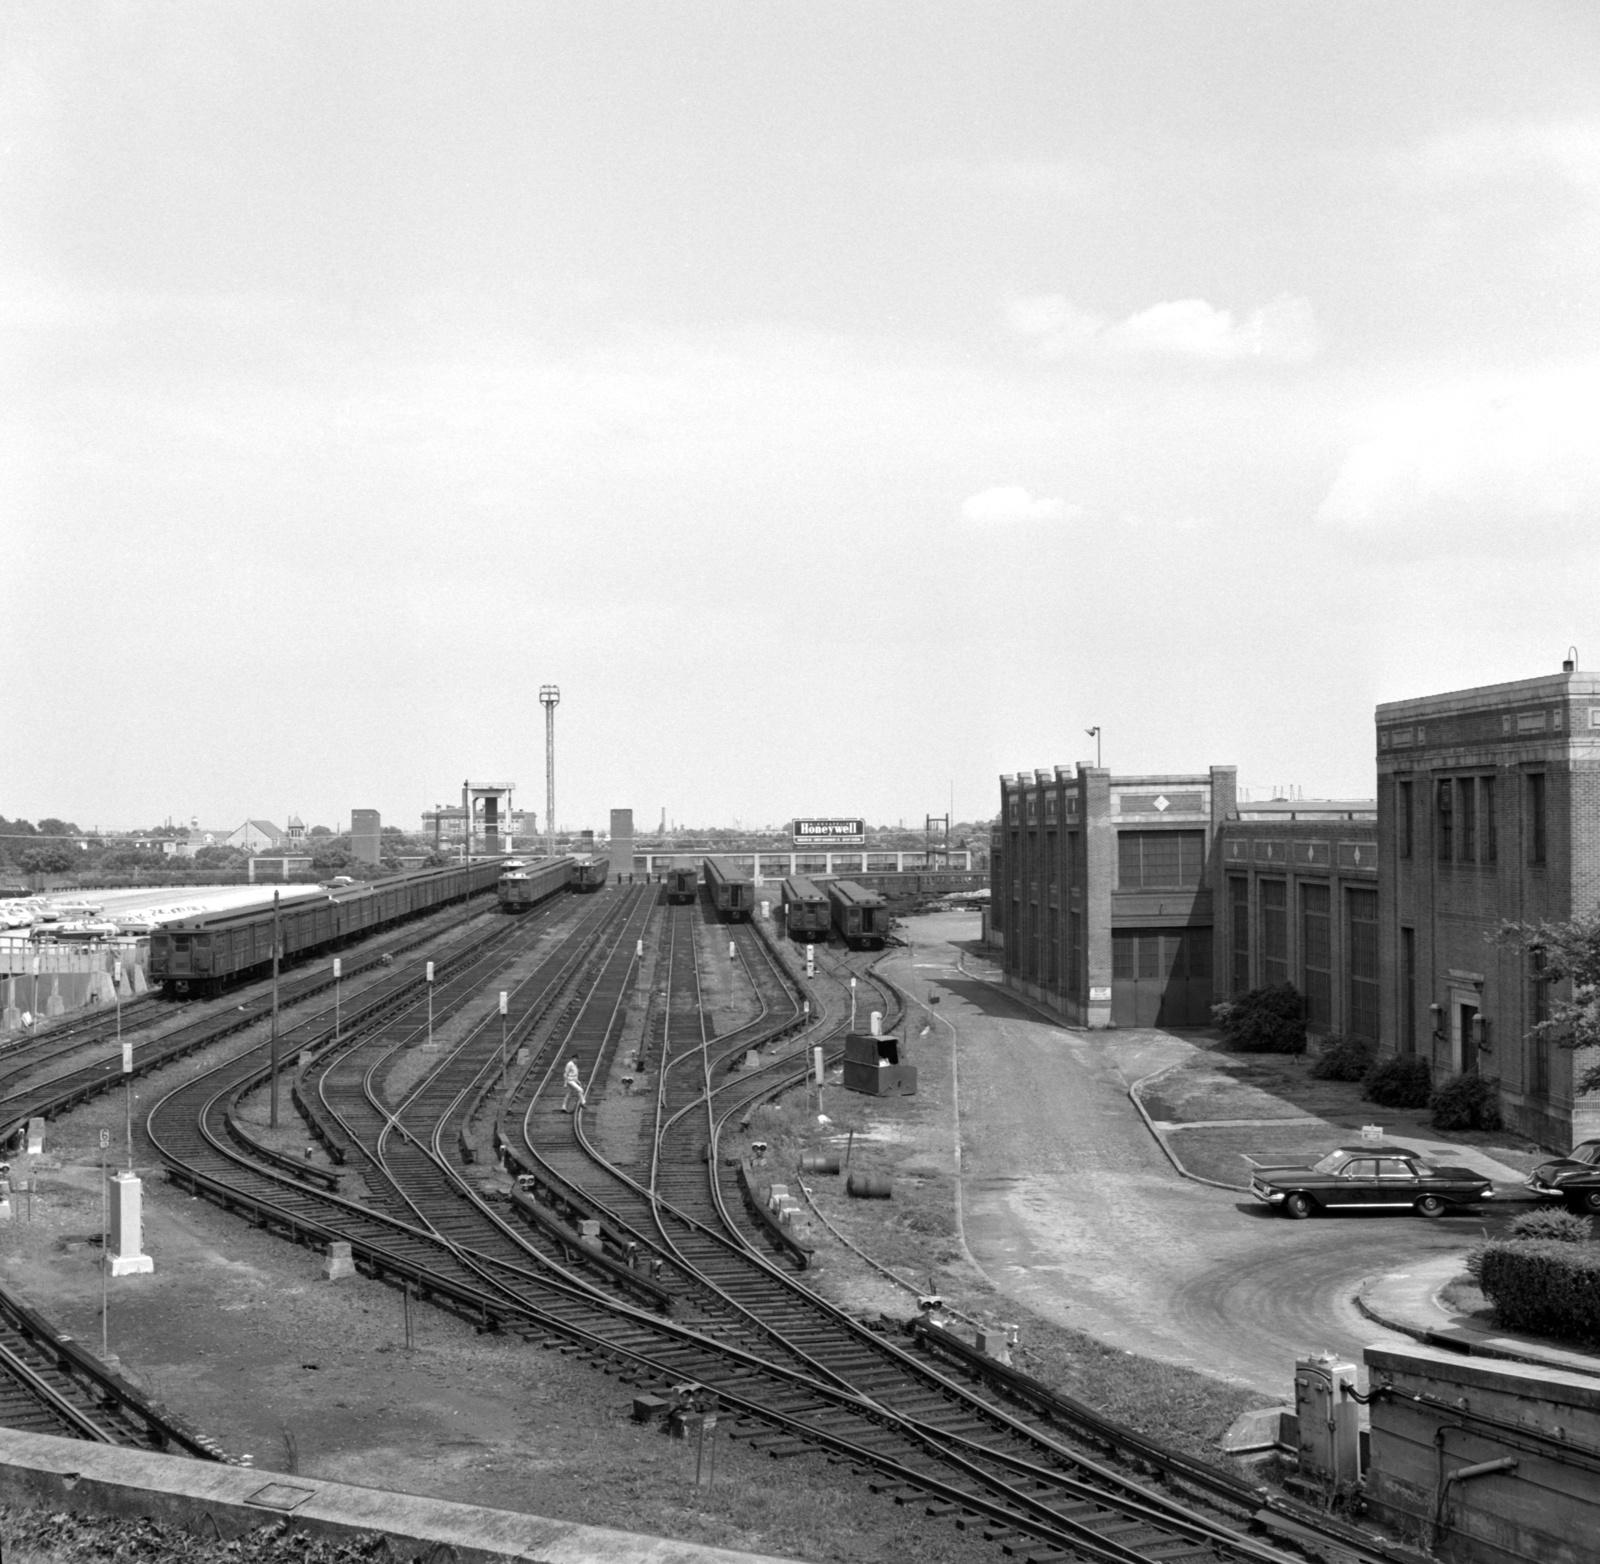 (708k, 1600x1564)<br><b>Country:</b> United States<br><b>City:</b> Philadelphia, PA<br><b>System:</b> SEPTA (or Predecessor)<br><b>Line:</b> Broad Street Subway<br><b>Location:</b> Fern Rock Yard/Shops<br><b>Collection of:</b> David Pirmann<br><b>Date:</b> 6/15/1963<br><b>Viewed (this week/total):</b> 1 / 84